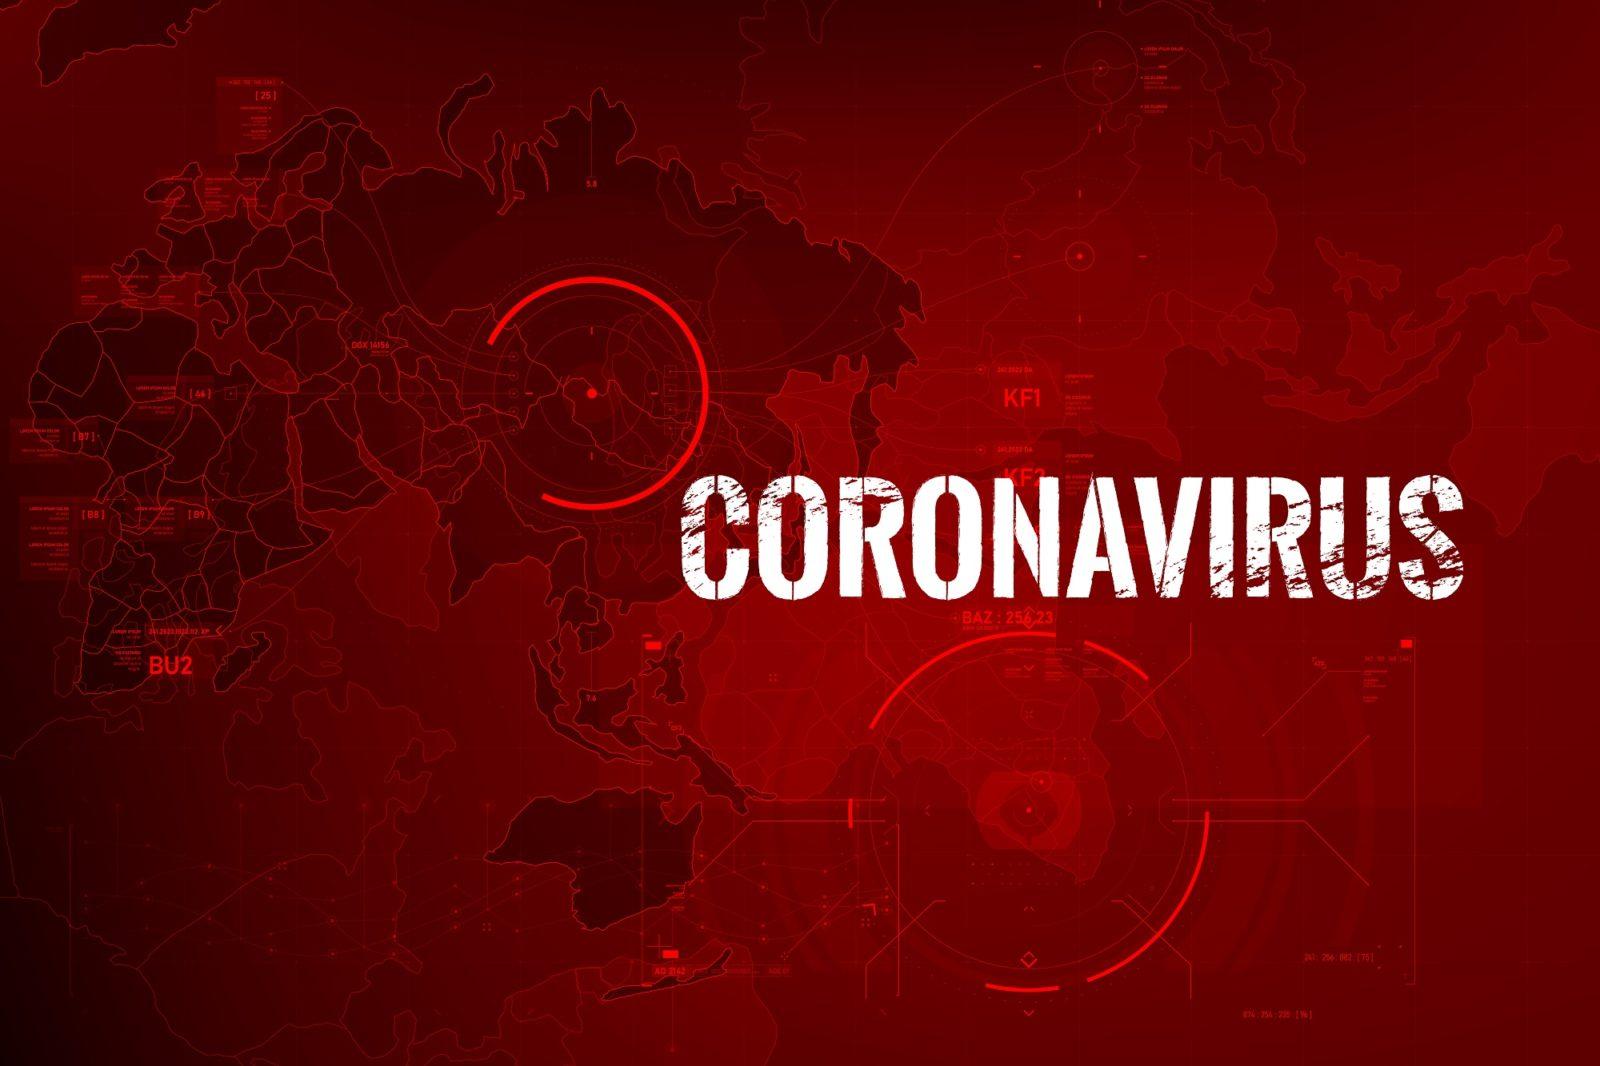 Covid 19 - Reurasia